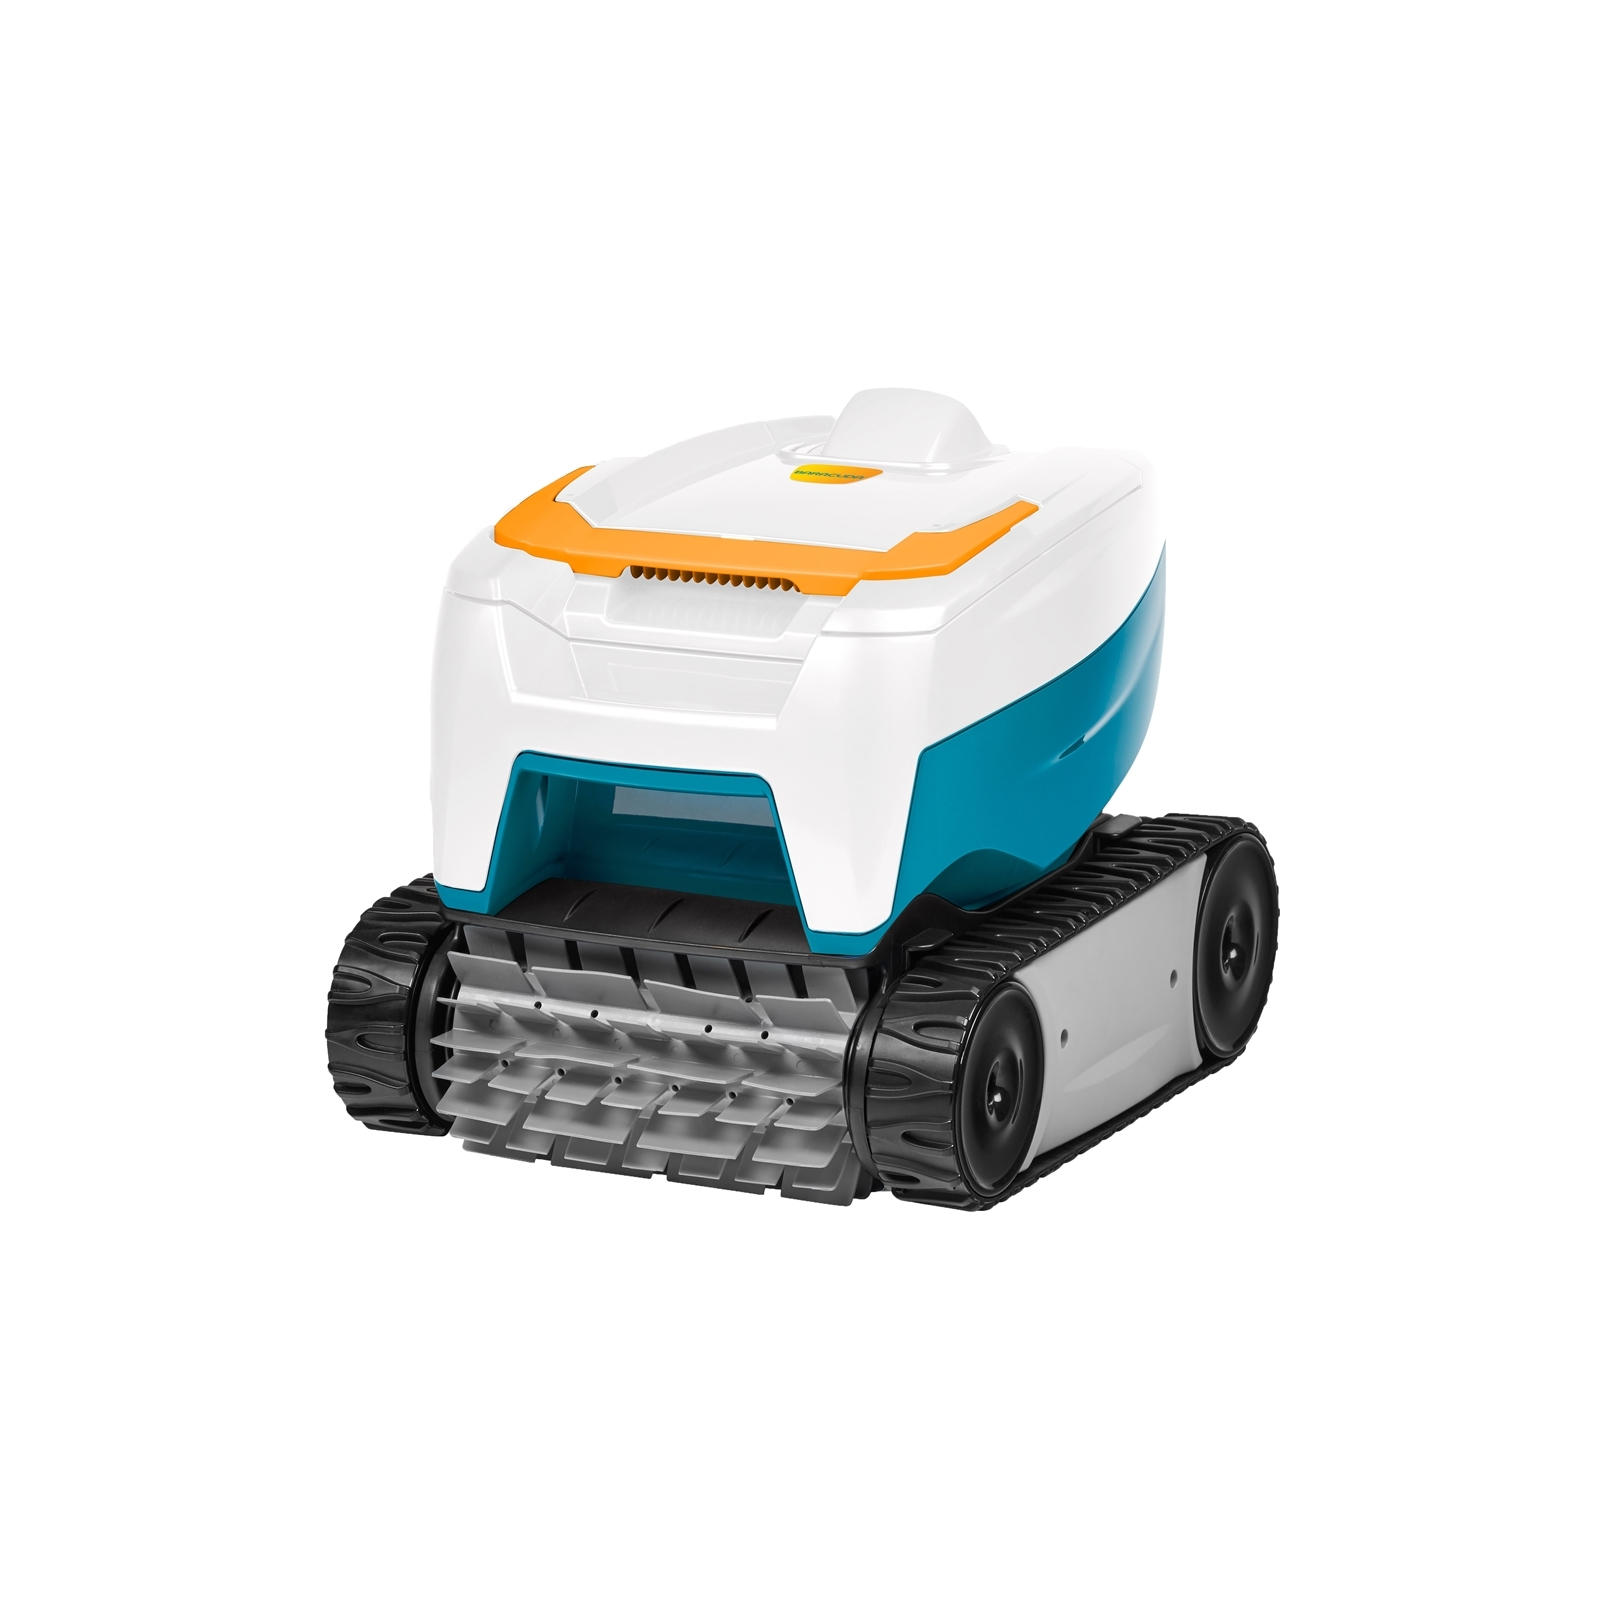 Baracuda Rova Robotic Pool Cleaner - Floor Only